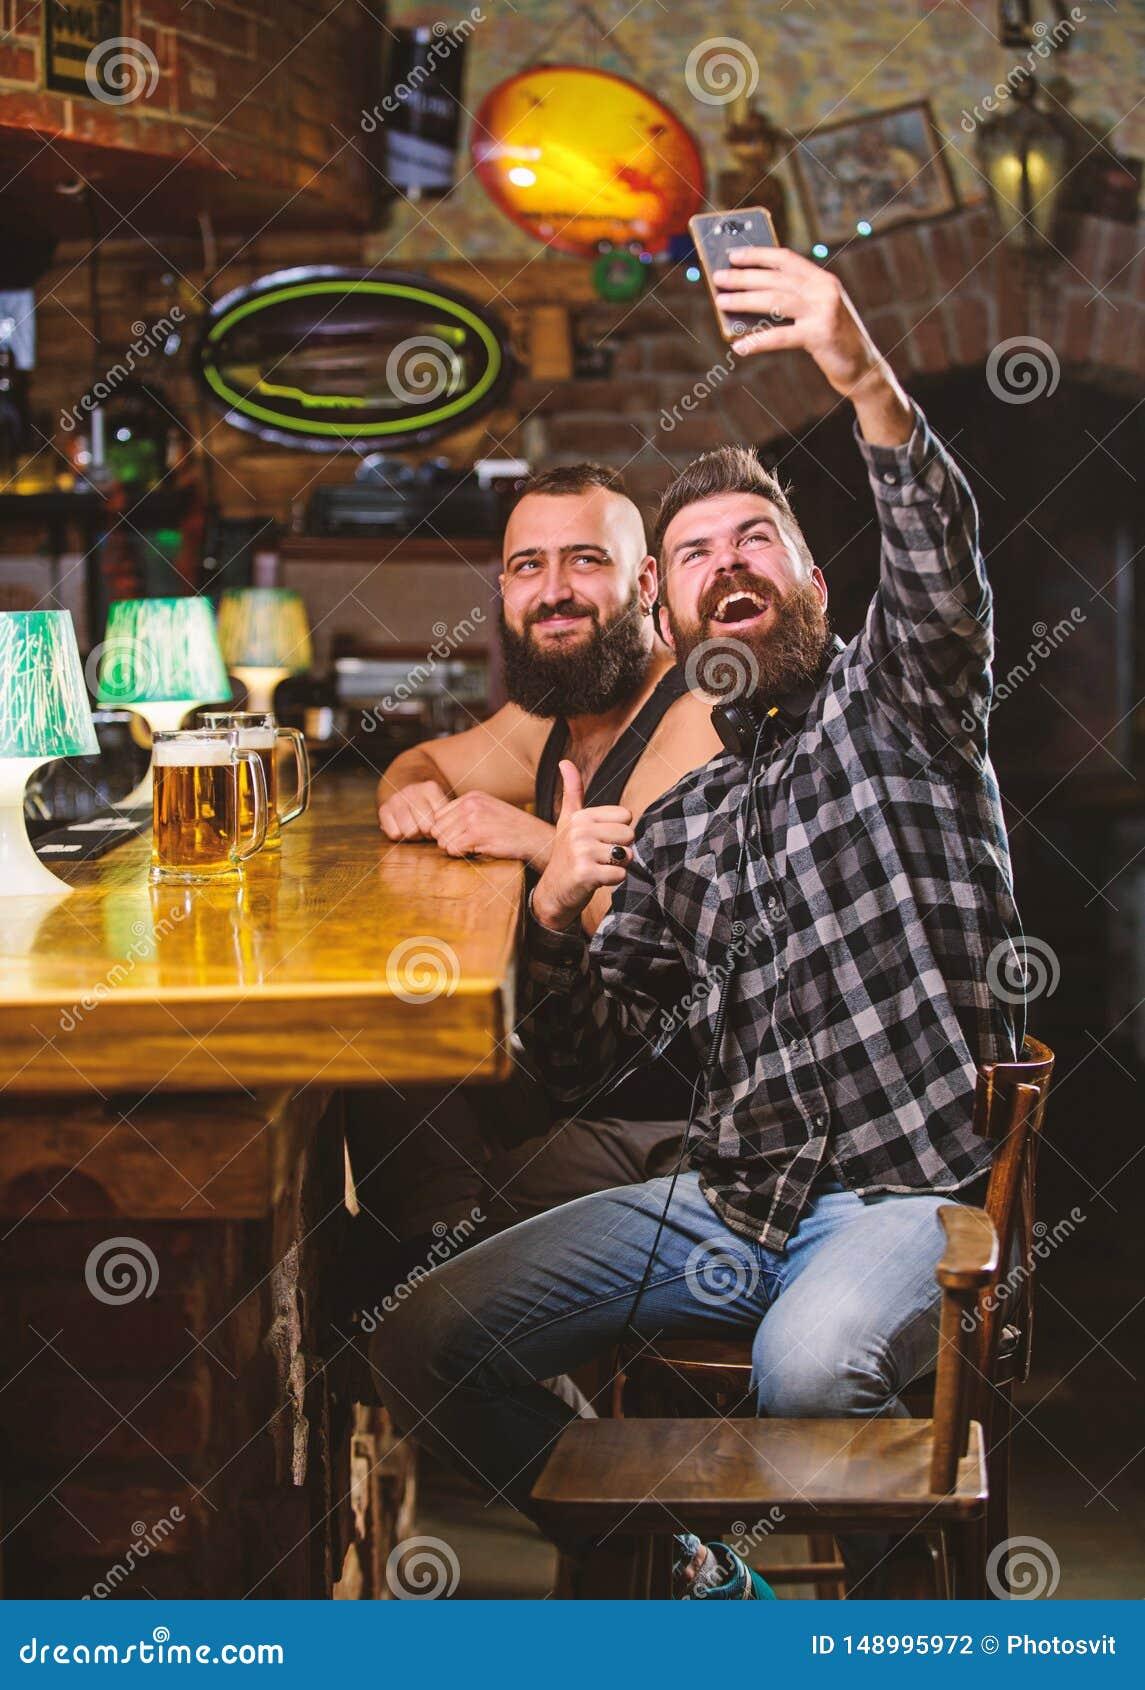 Foto del selfie de la toma para recordar la gran tarde en pub Comunicaci?n en l?nea Smartphone barbudo del control del inconformi